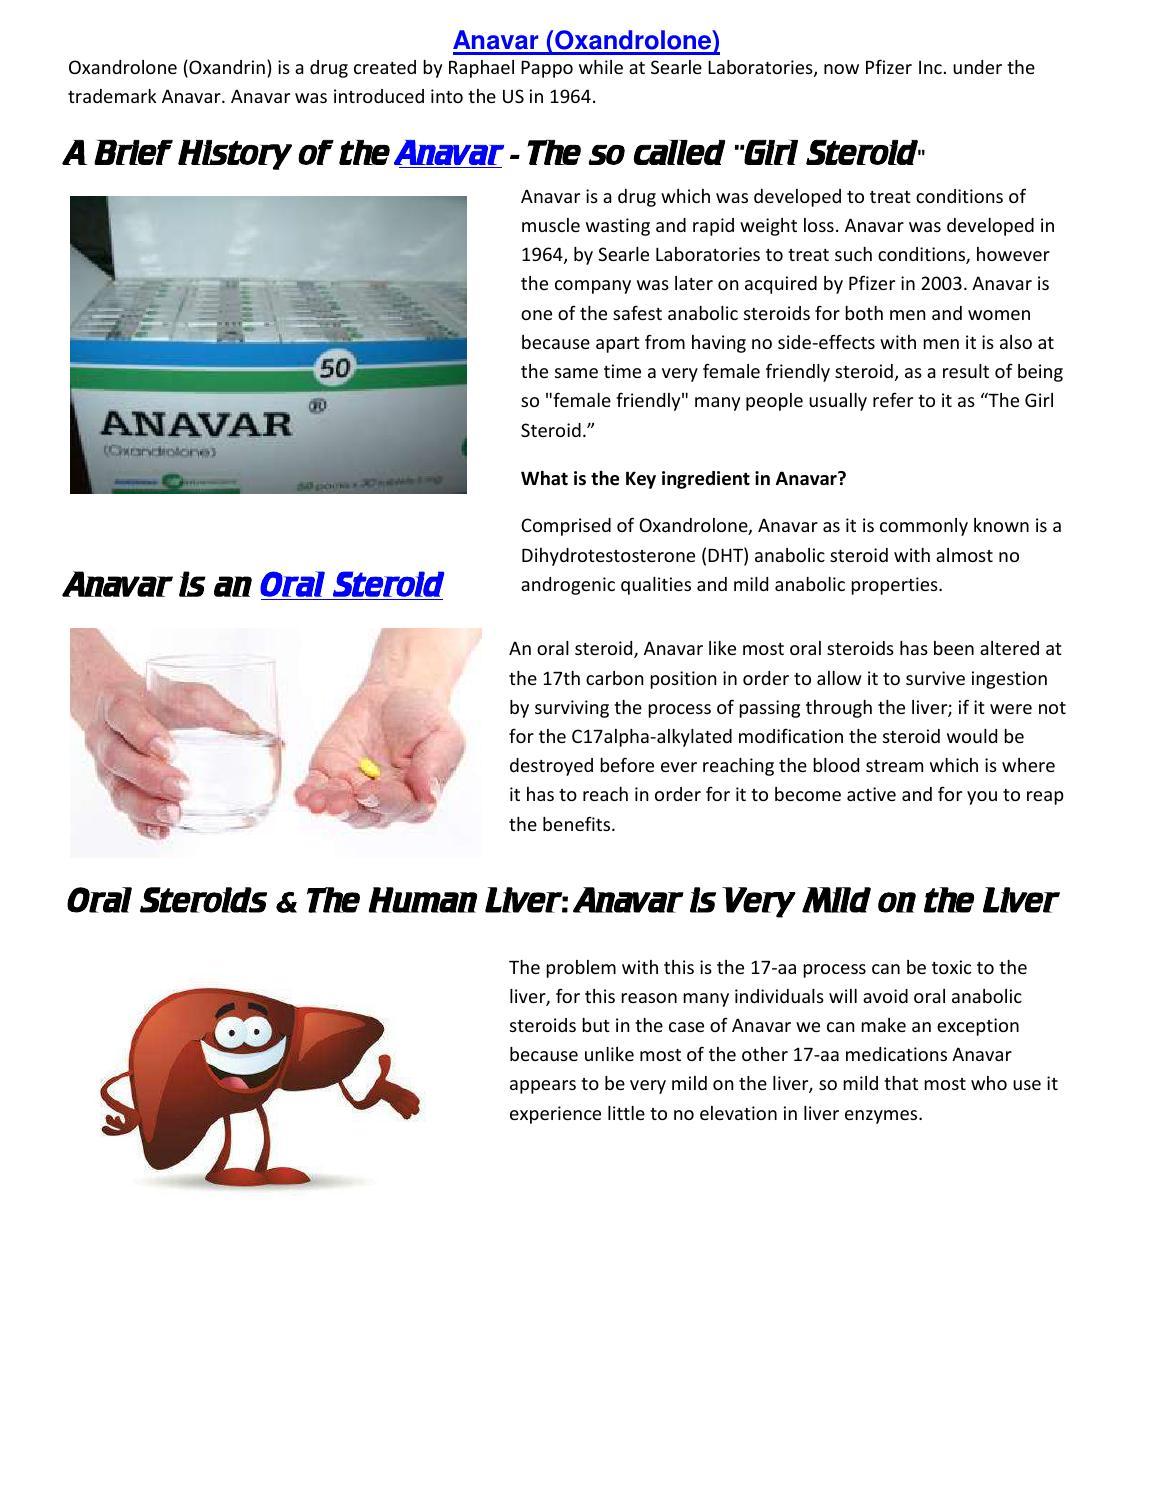 Pdf anavar the girl steroid by Jawara Breezy - issuu